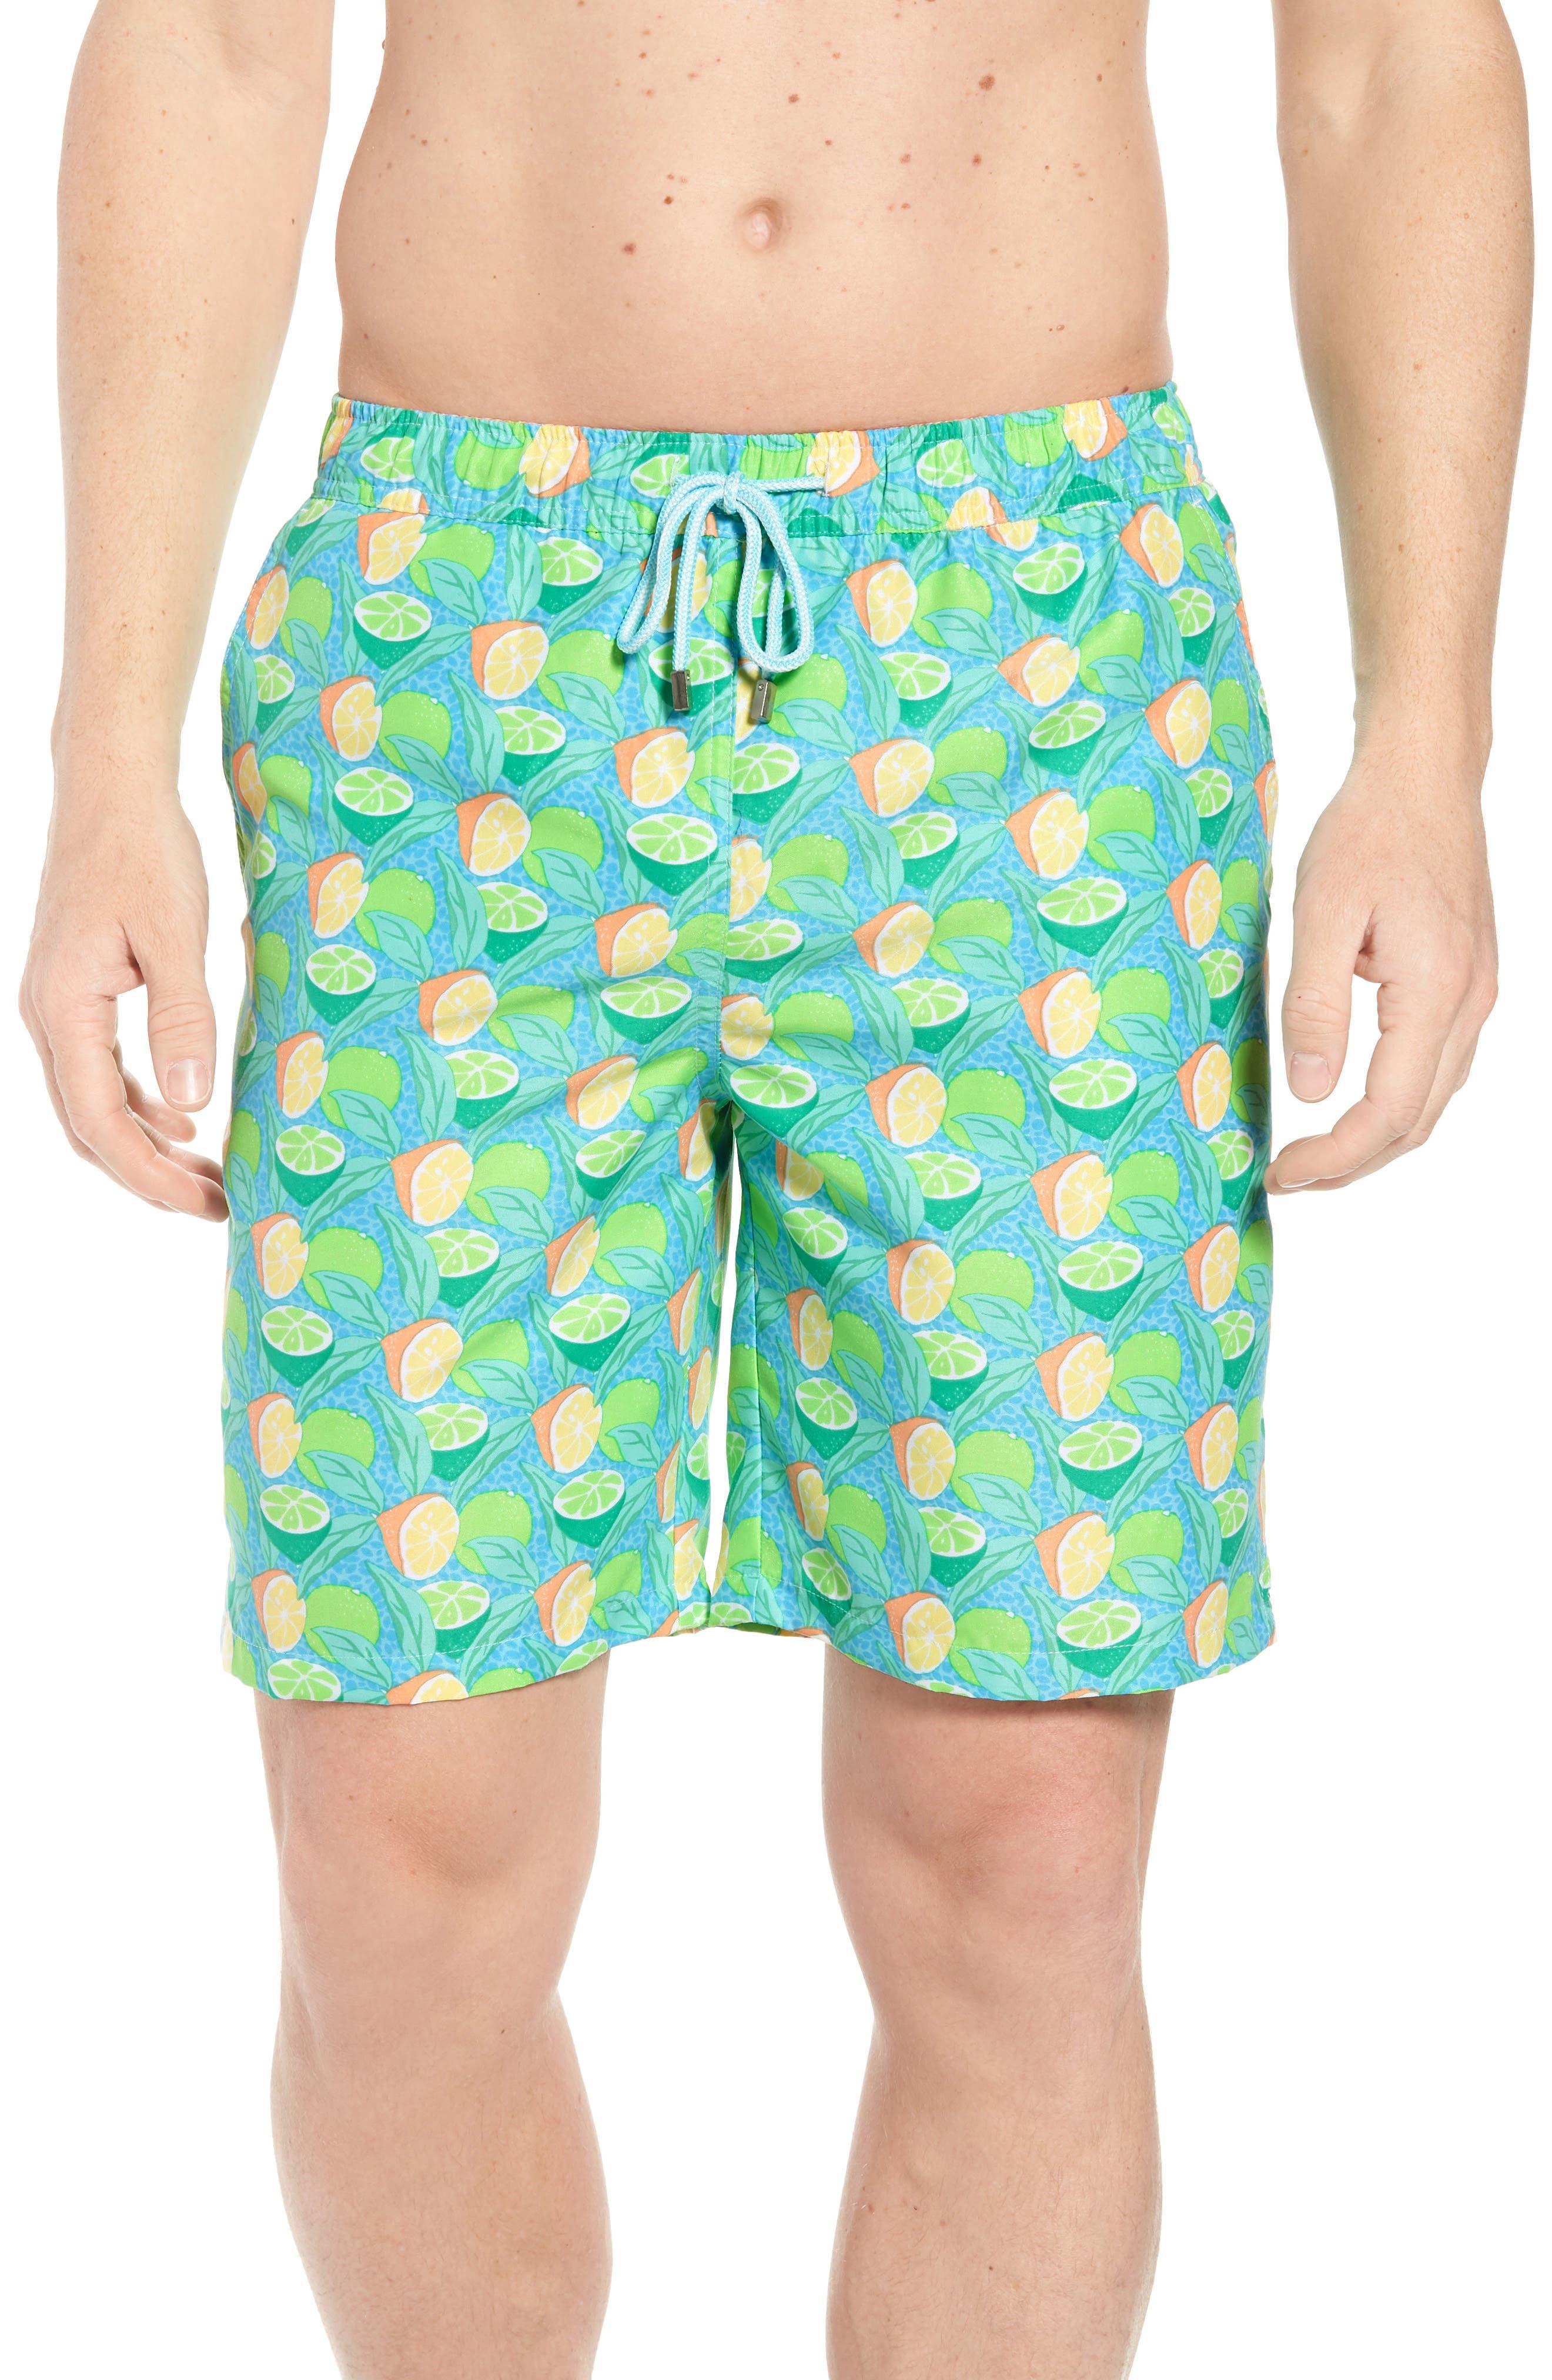 Sour Lemons Swim Trunks,                         Main,                         color, 327